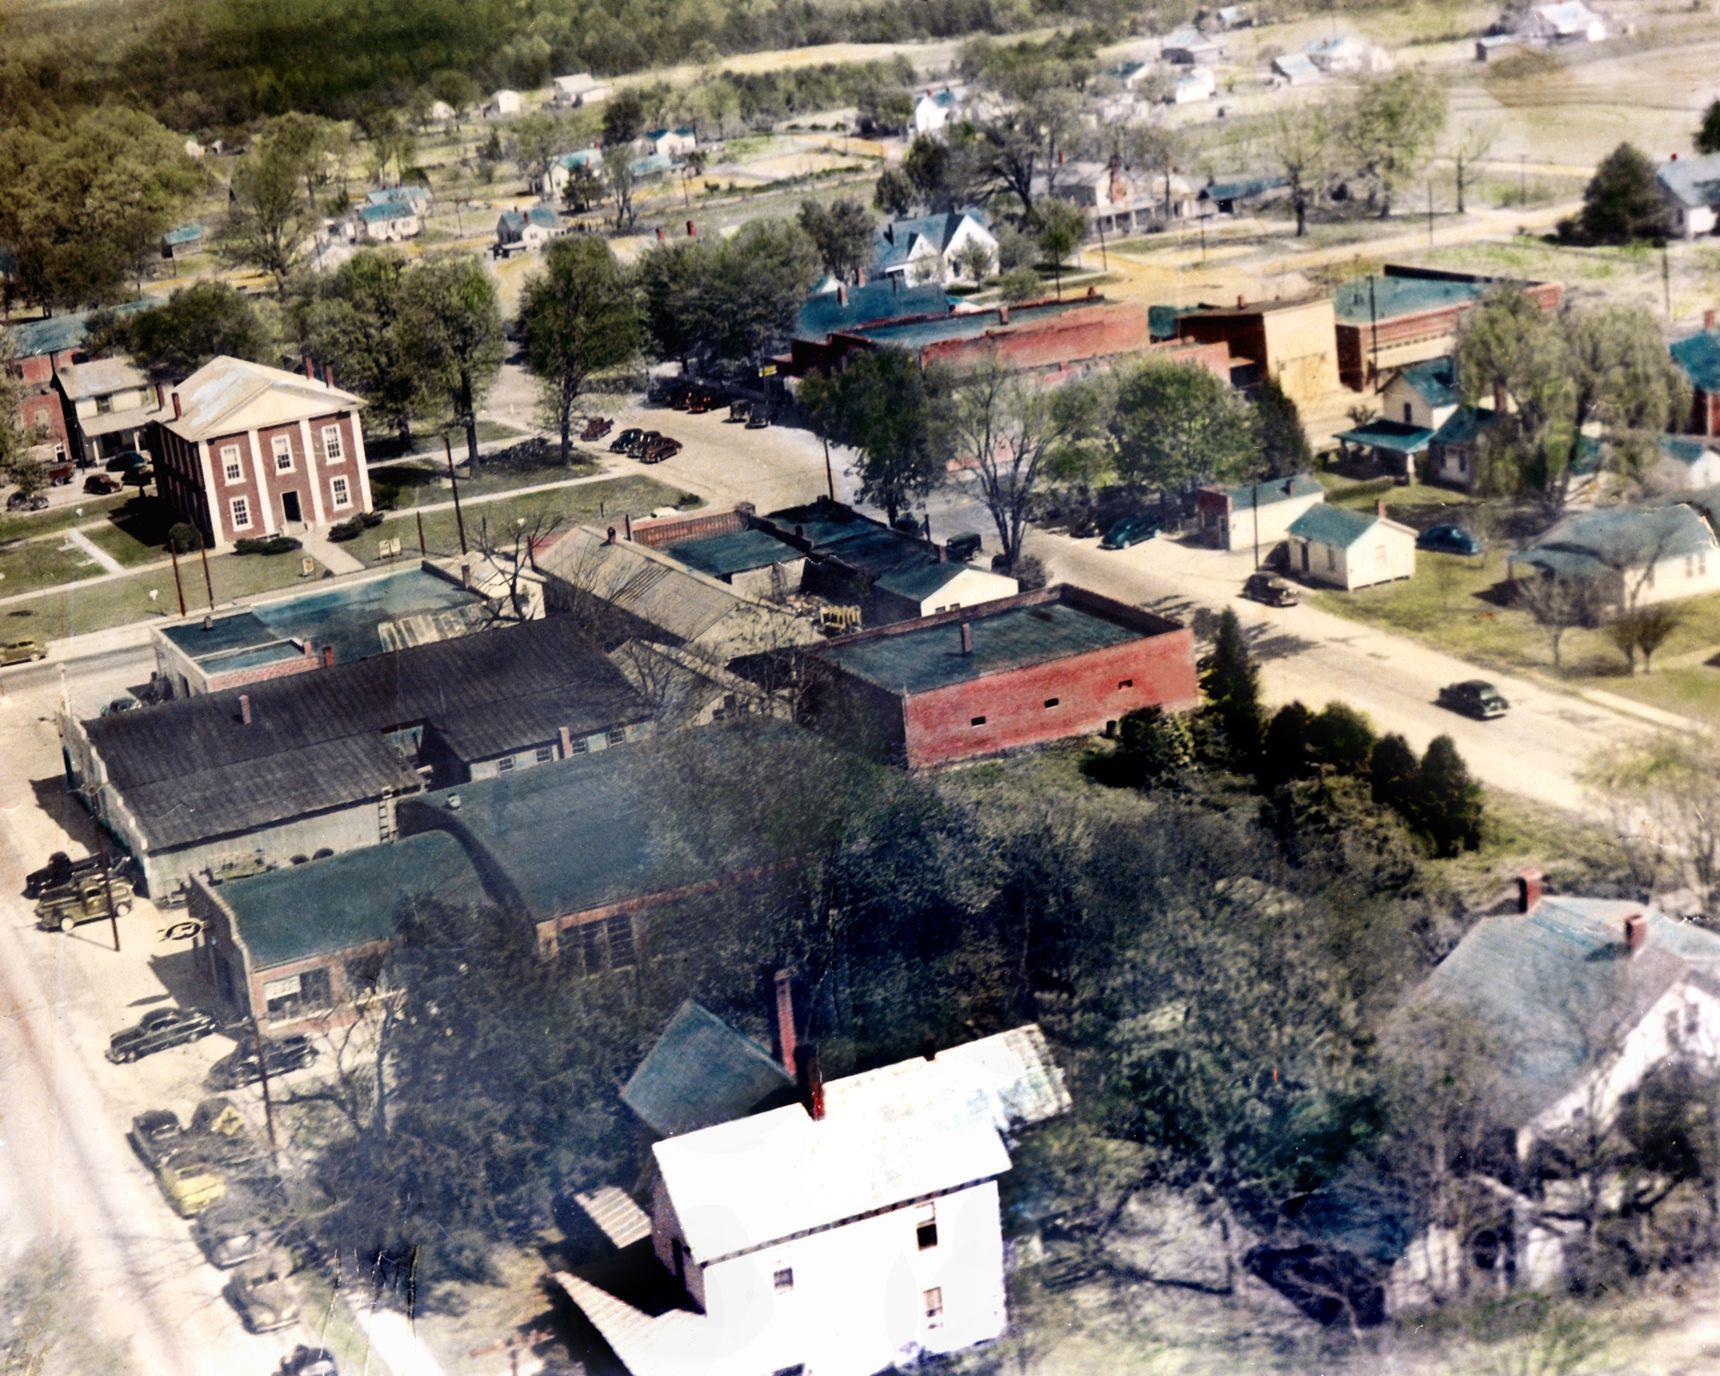 Yadkinville Christmas Parade 2020 About Yadkinville | Town of Yadkinville, NC